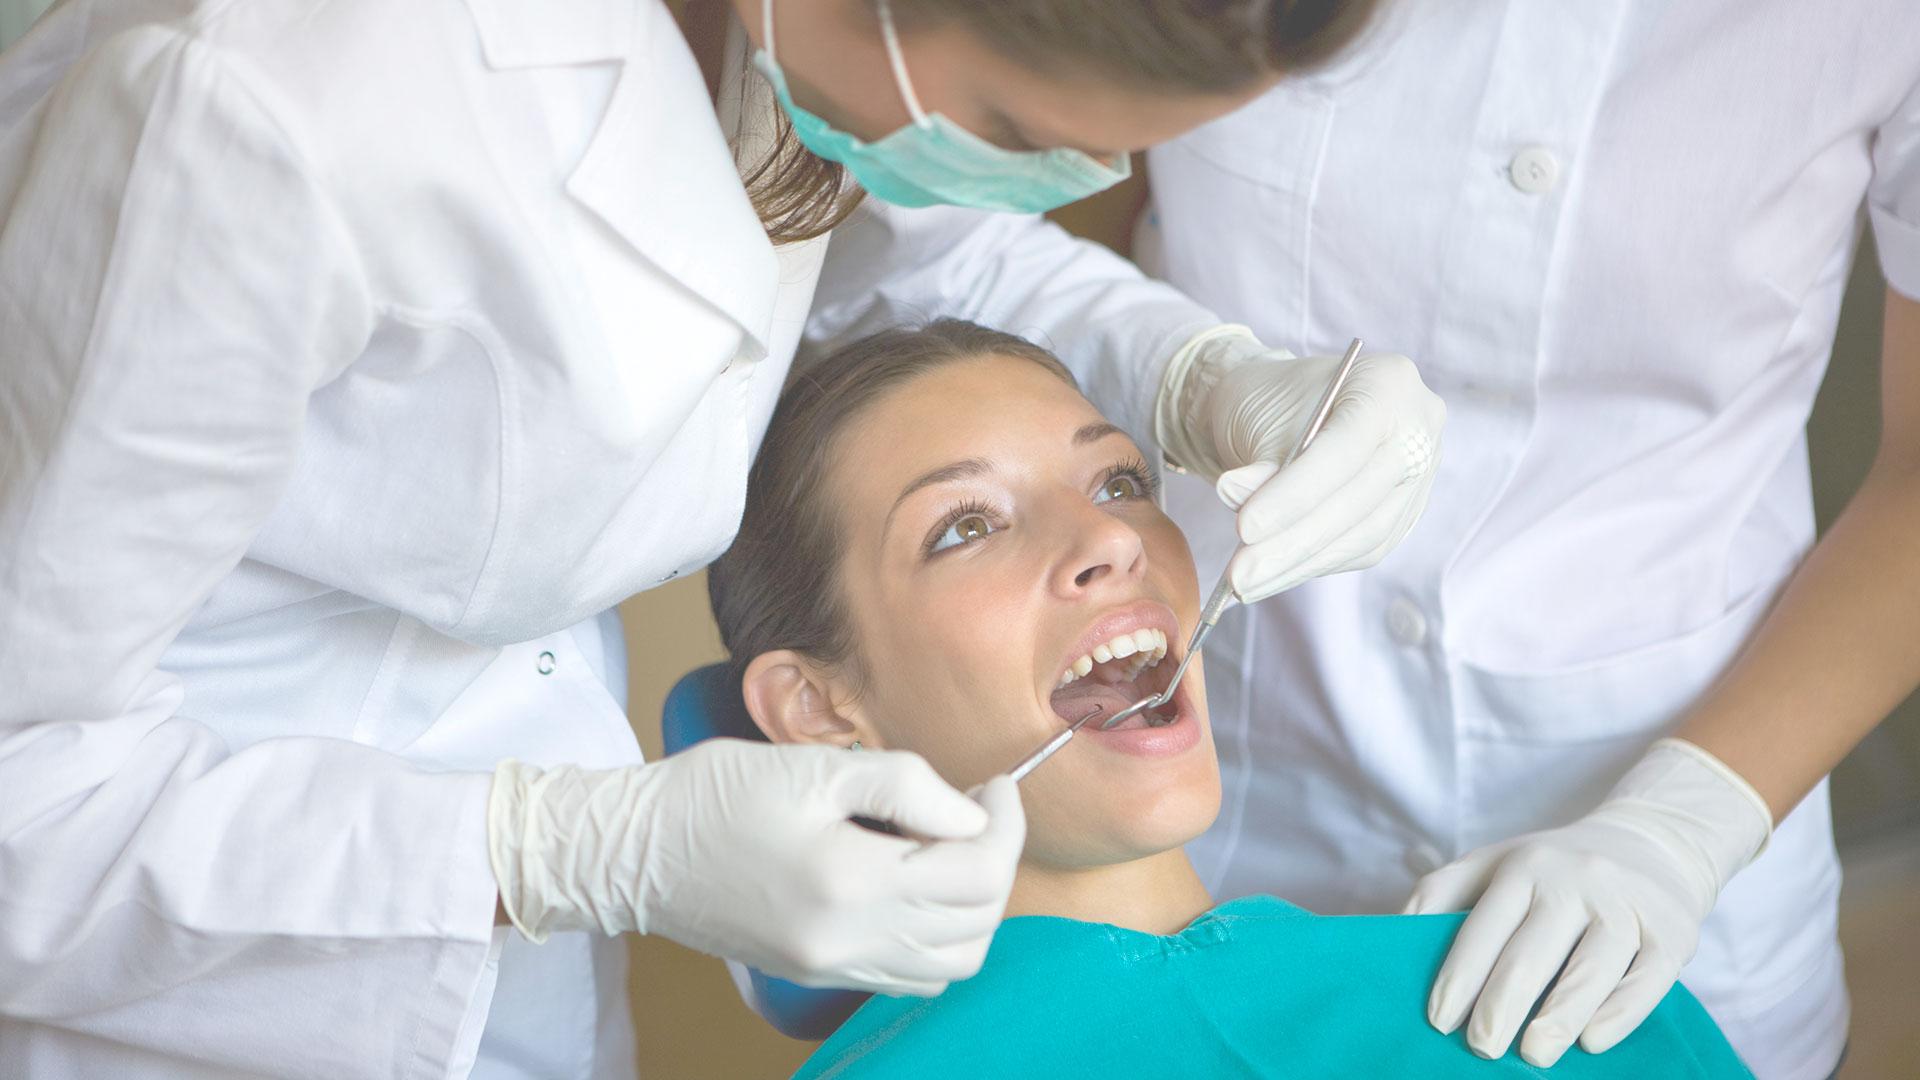 Hygientist-image-top